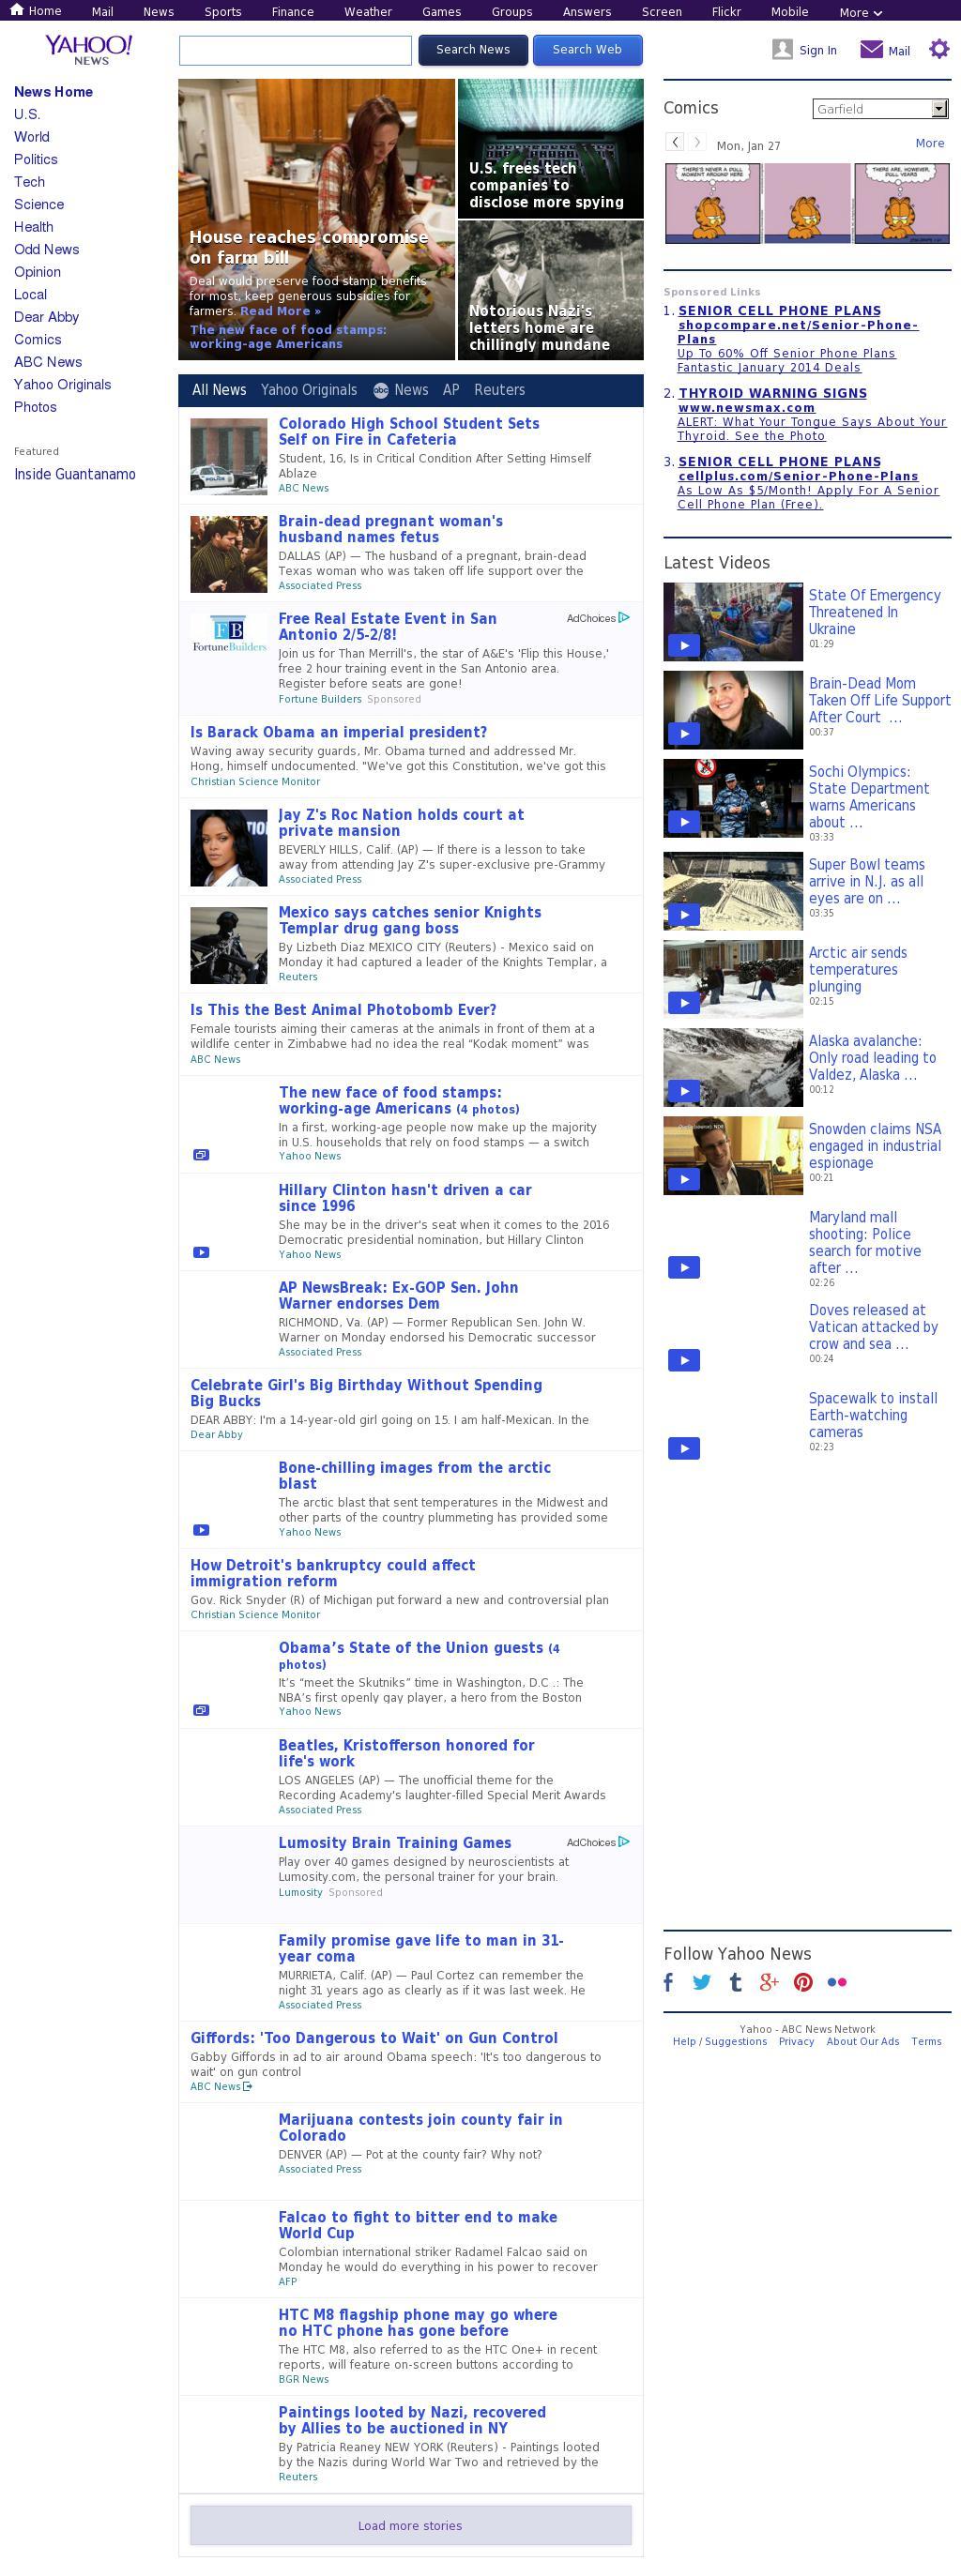 Yahoo! News at Tuesday Jan. 28, 2014, 2:26 a.m. UTC